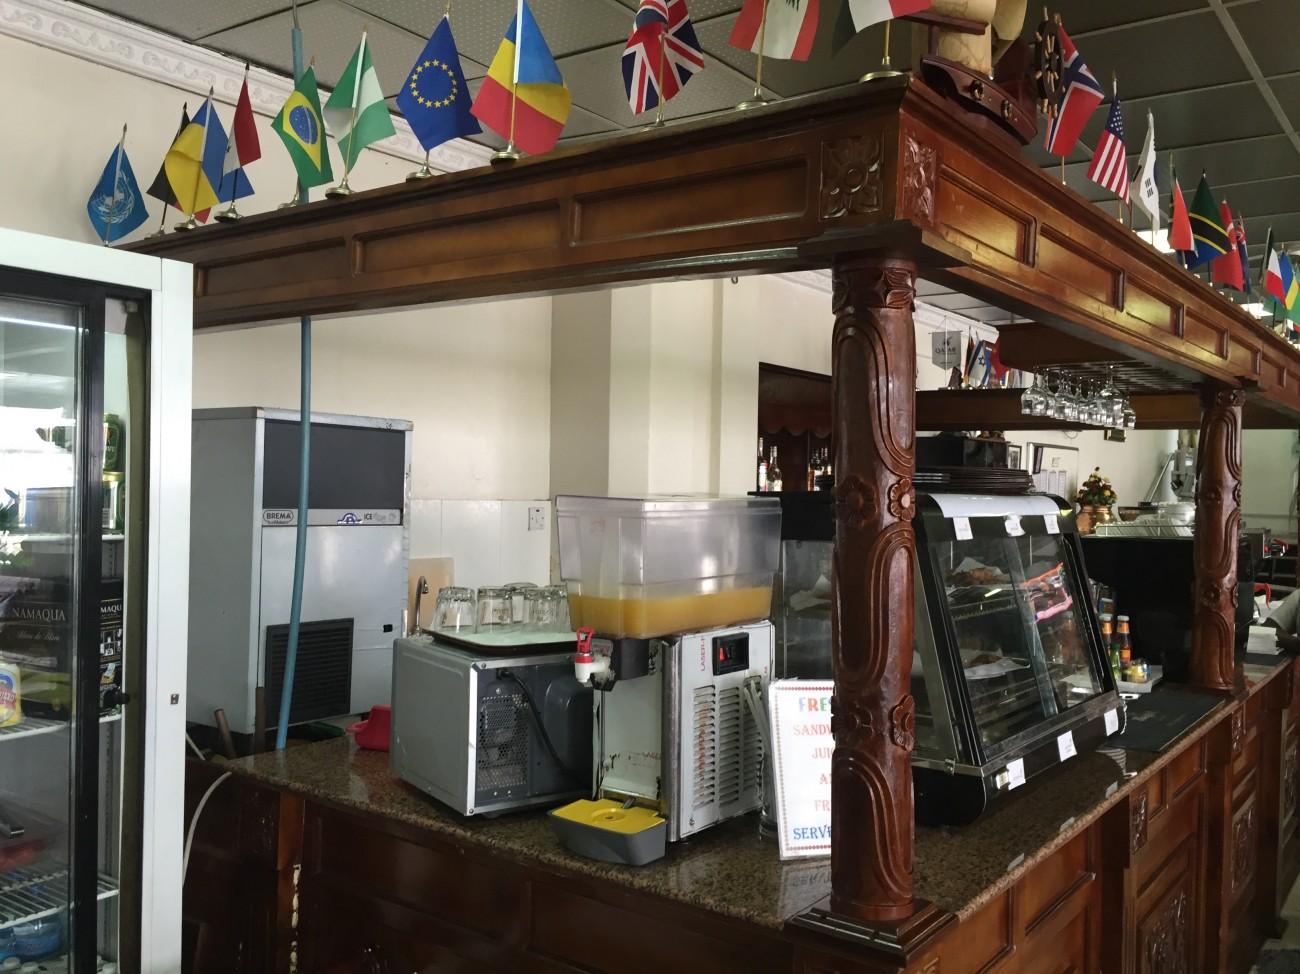 Tanzania Lounge Dar Es Salaam - 010